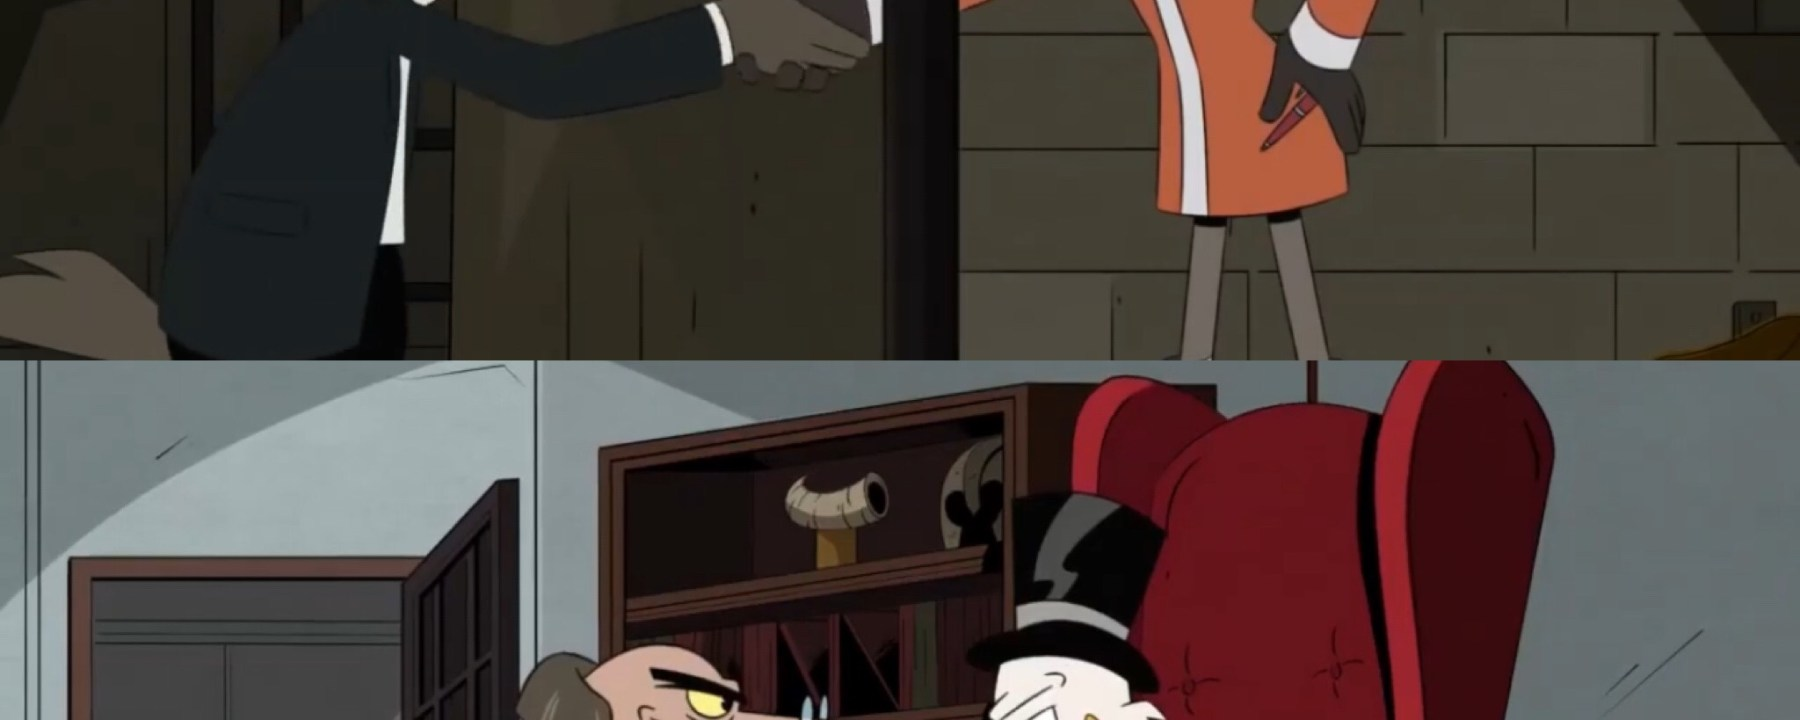 DuckTales Season 3, Episode 16- The First Adventure